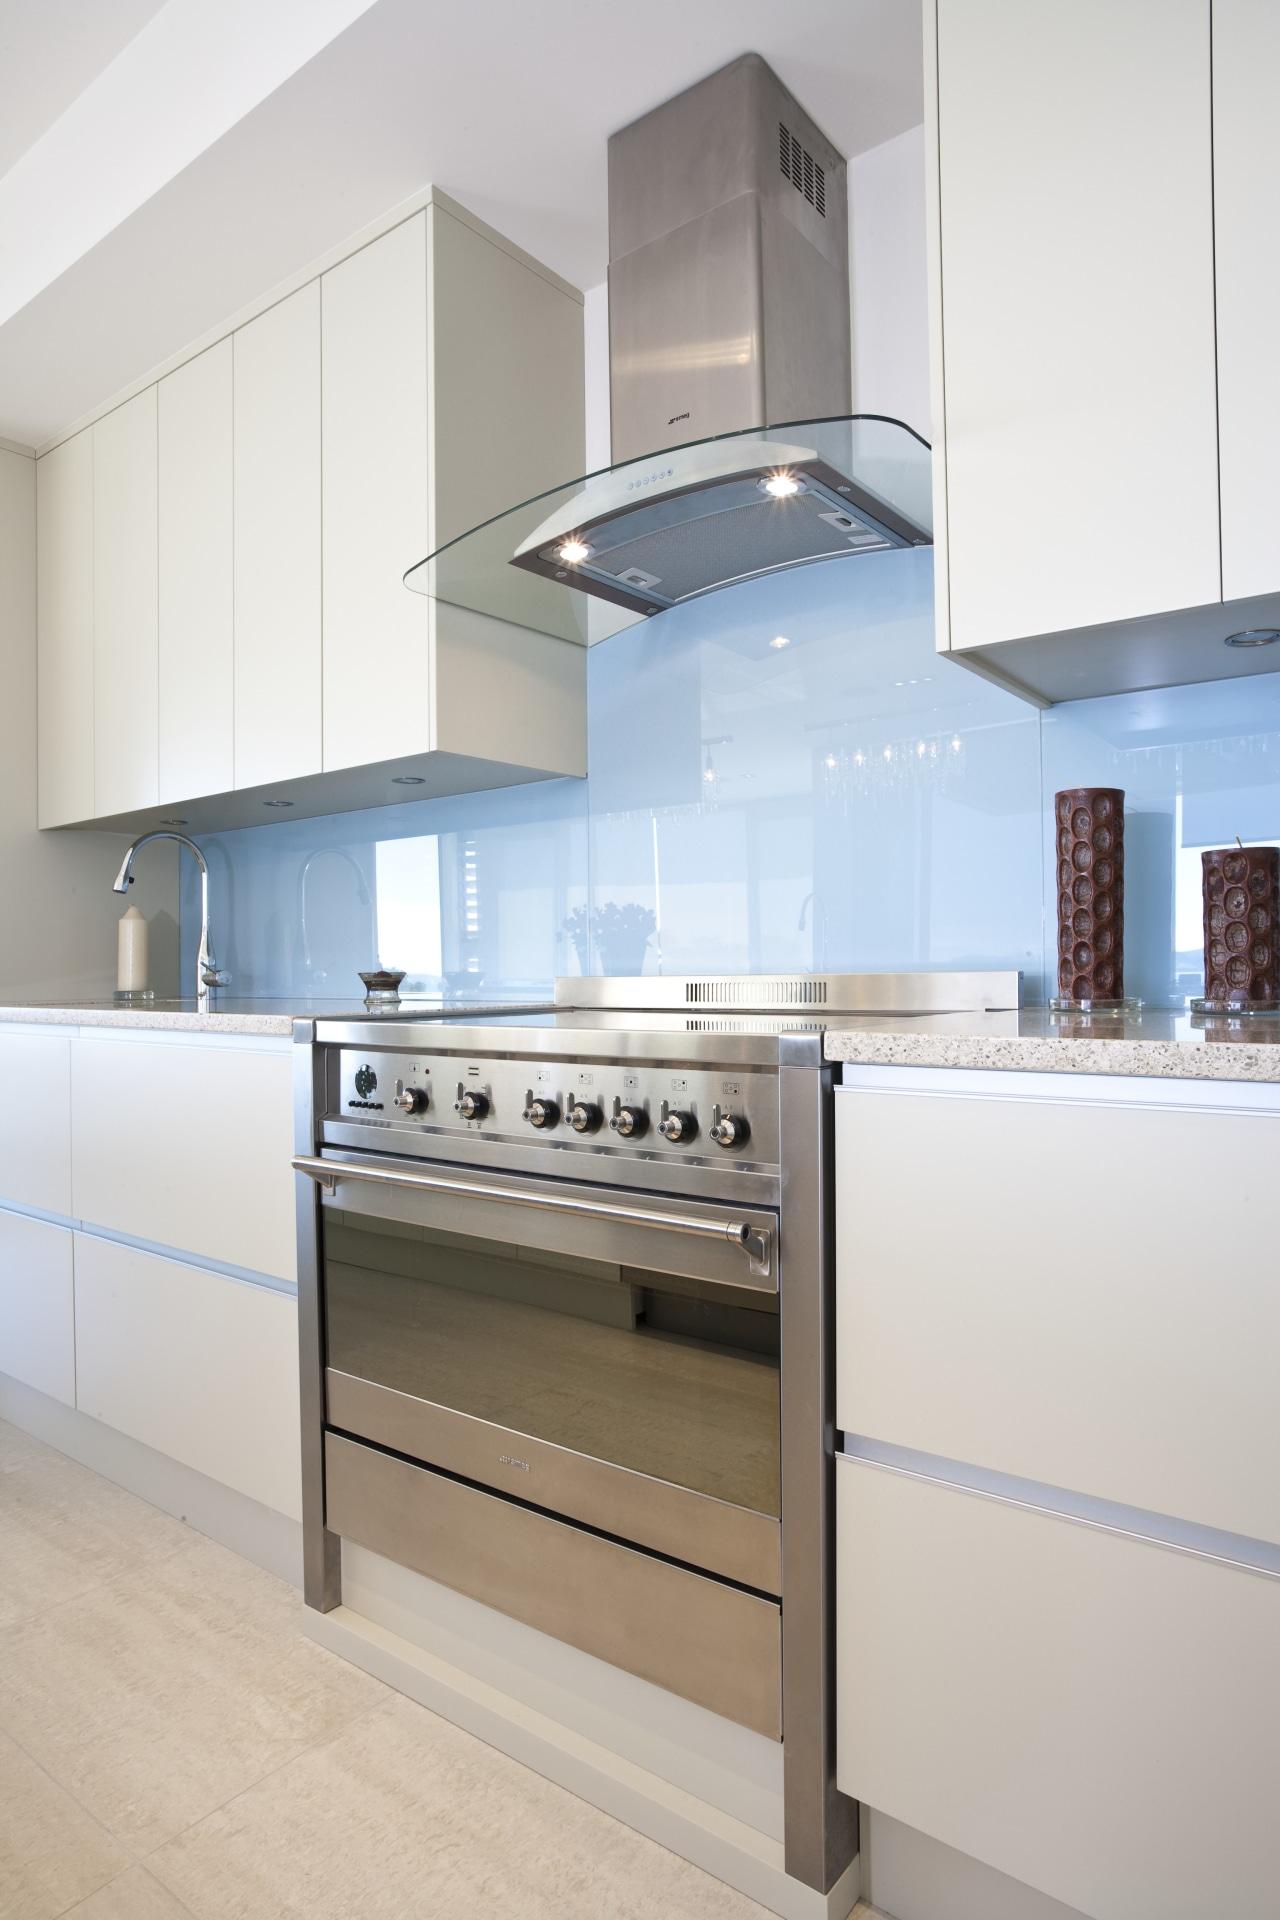 View of a kitchen which features Smeg appliances cabinetry, countertop, cuisine classique, home appliance, interior design, kitchen, kitchen stove, white